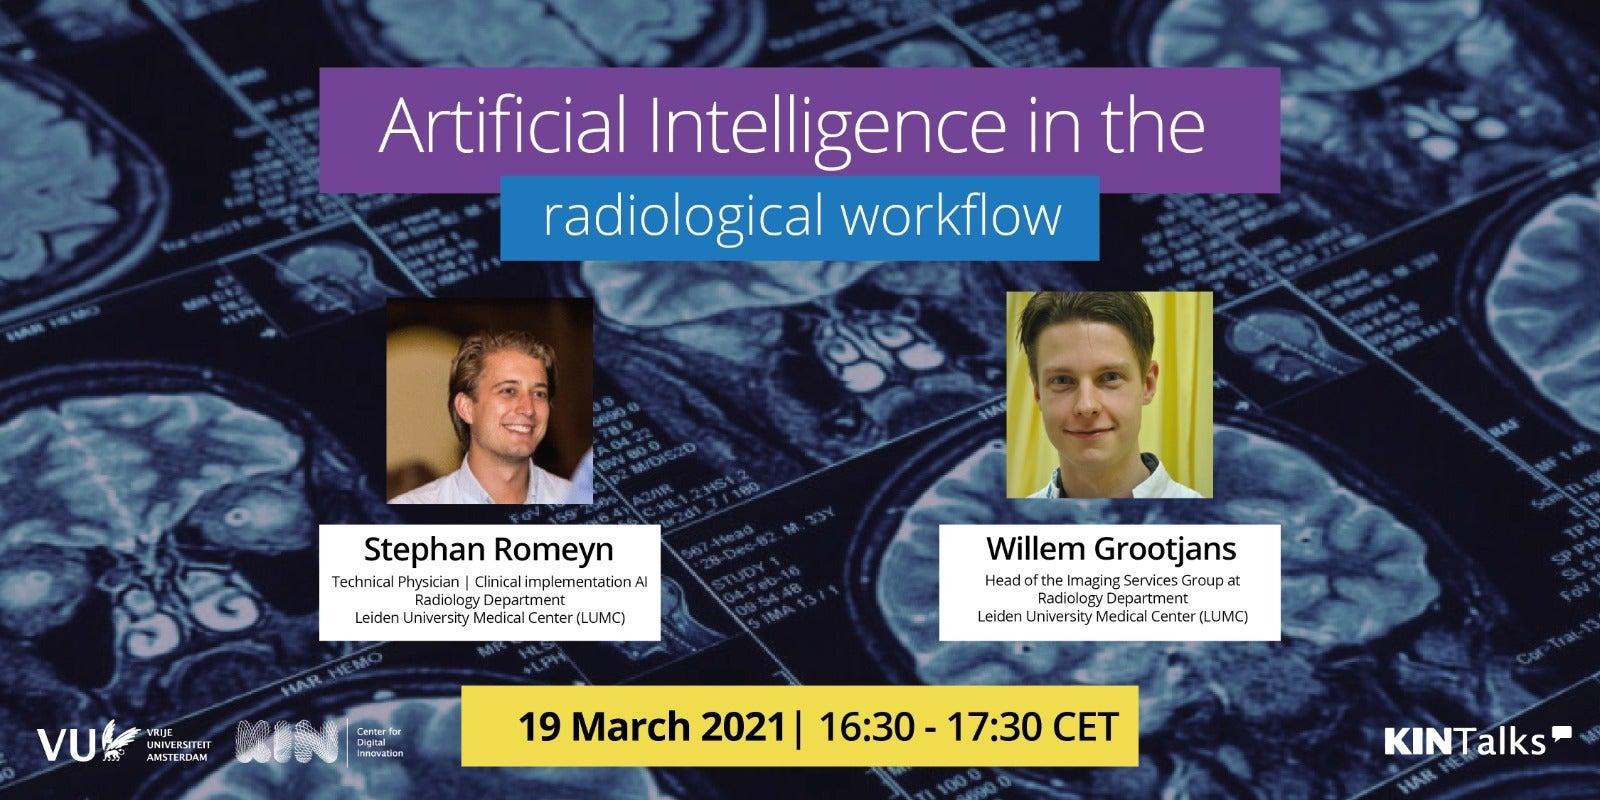 KINTalk AI in the radiolical workflow